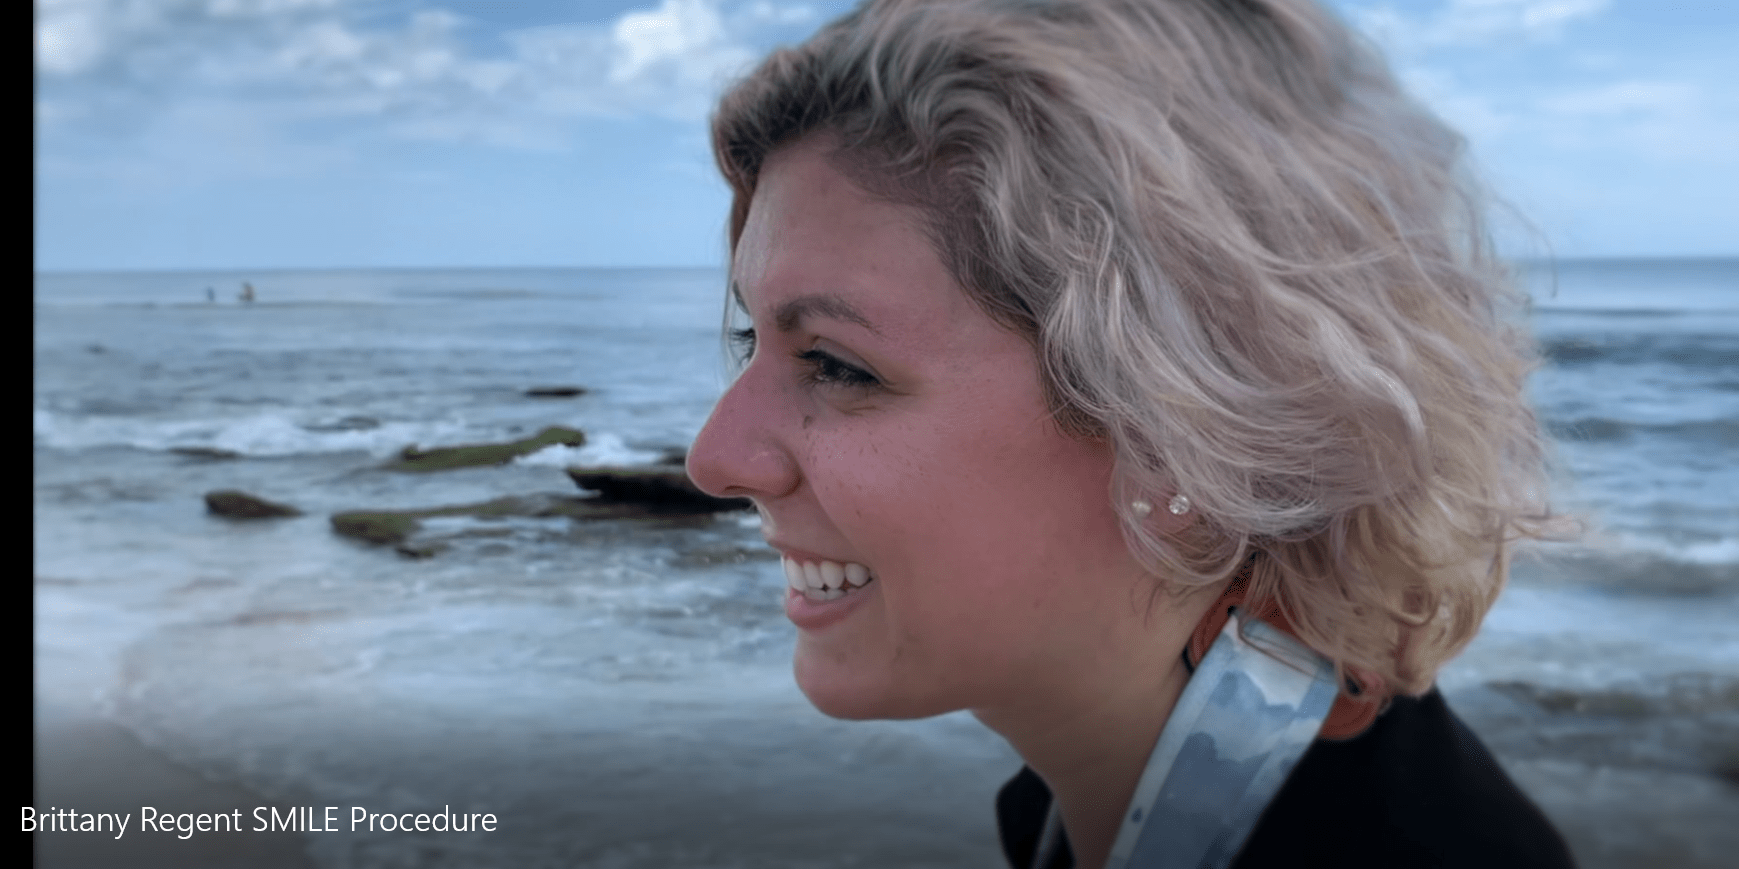 SMILE laser vision correction patient photographer Brittany Regent